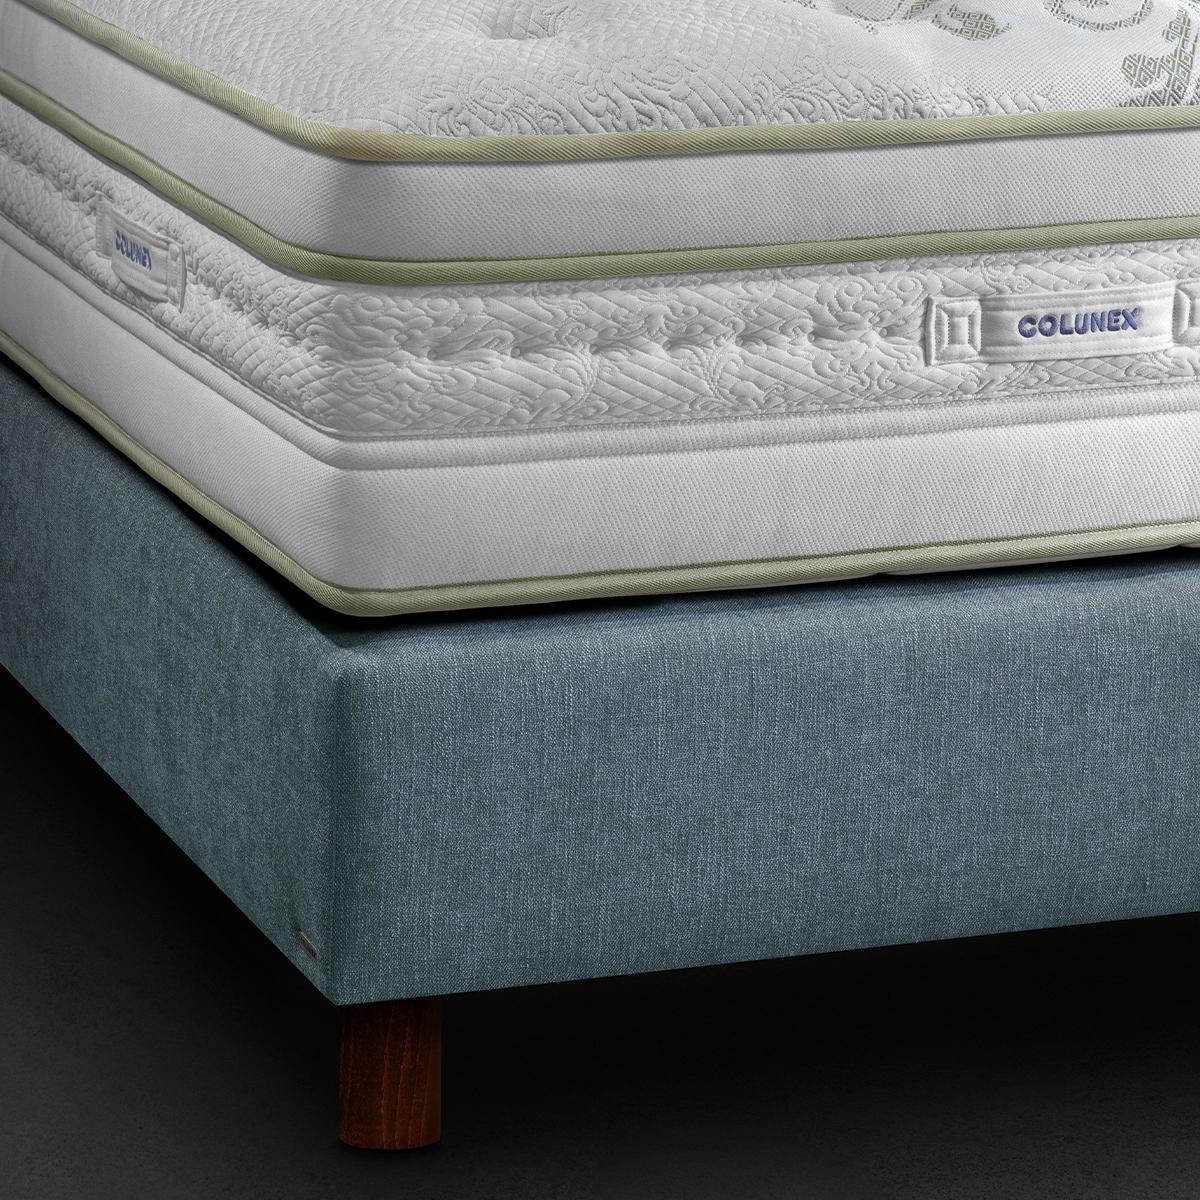 heritage ii Matela Heritage II colunex heritage II mattress 01 3